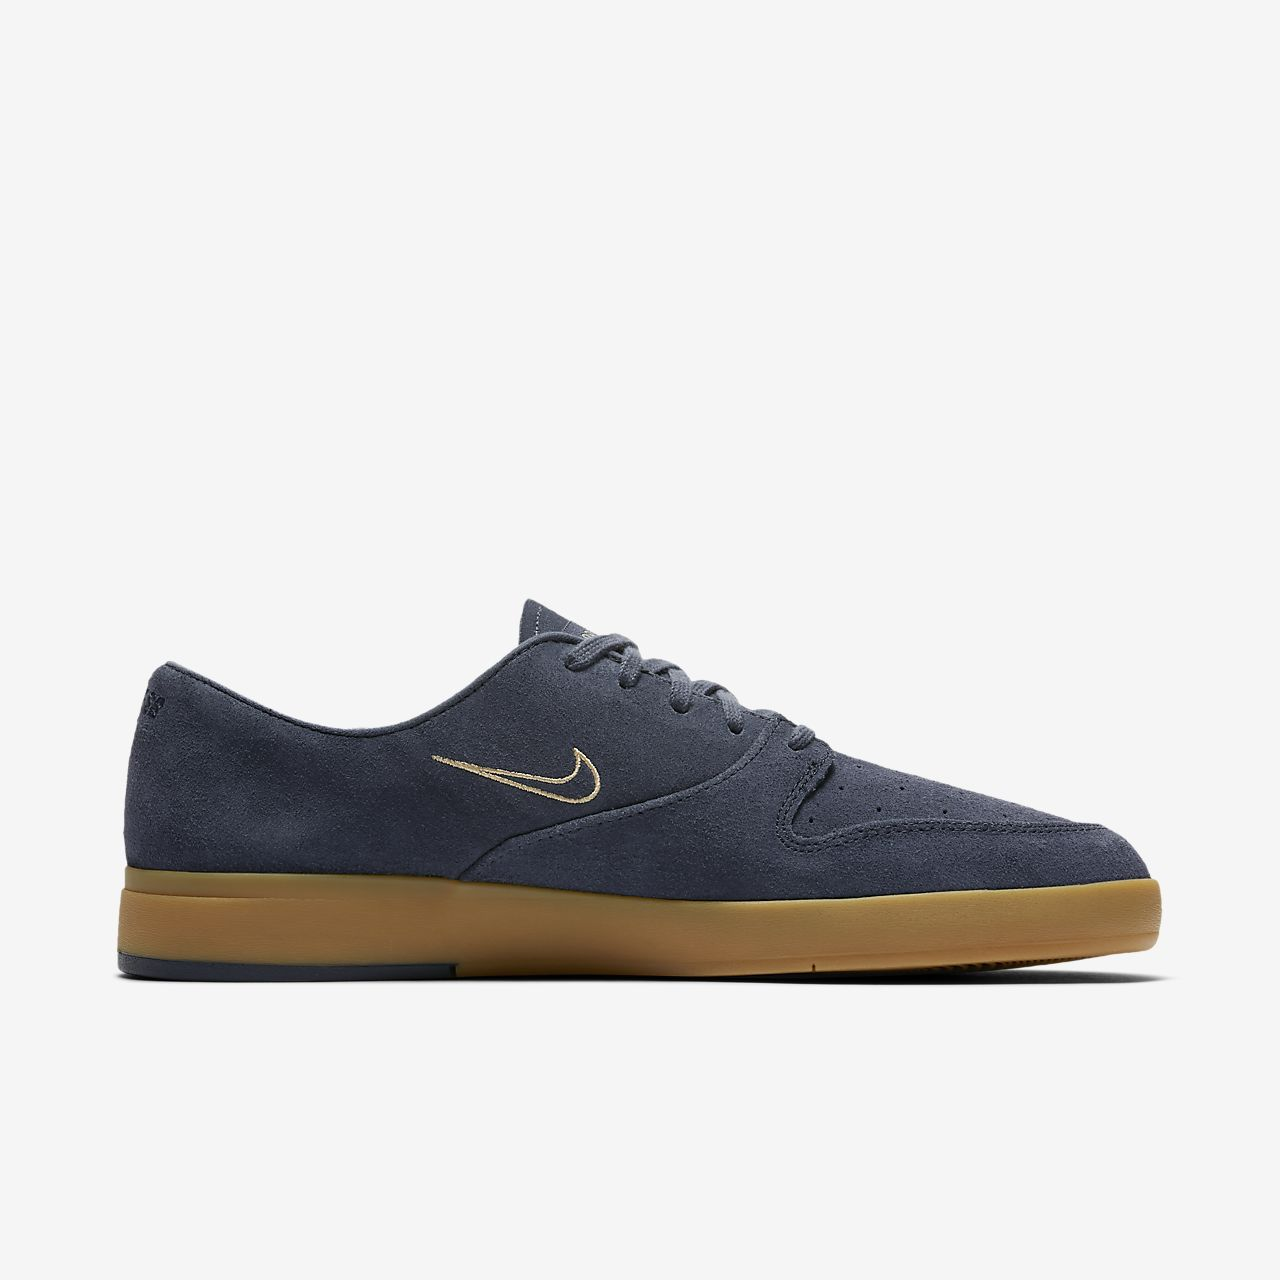 size 40 734a3 66f6f ... Nike SB Zoom Paul Rodriguez Rodriguez Rodriguez Ten Herren-Skateboardschuh  Mode Schuhe-AR2494DS 9ccbe0 ...